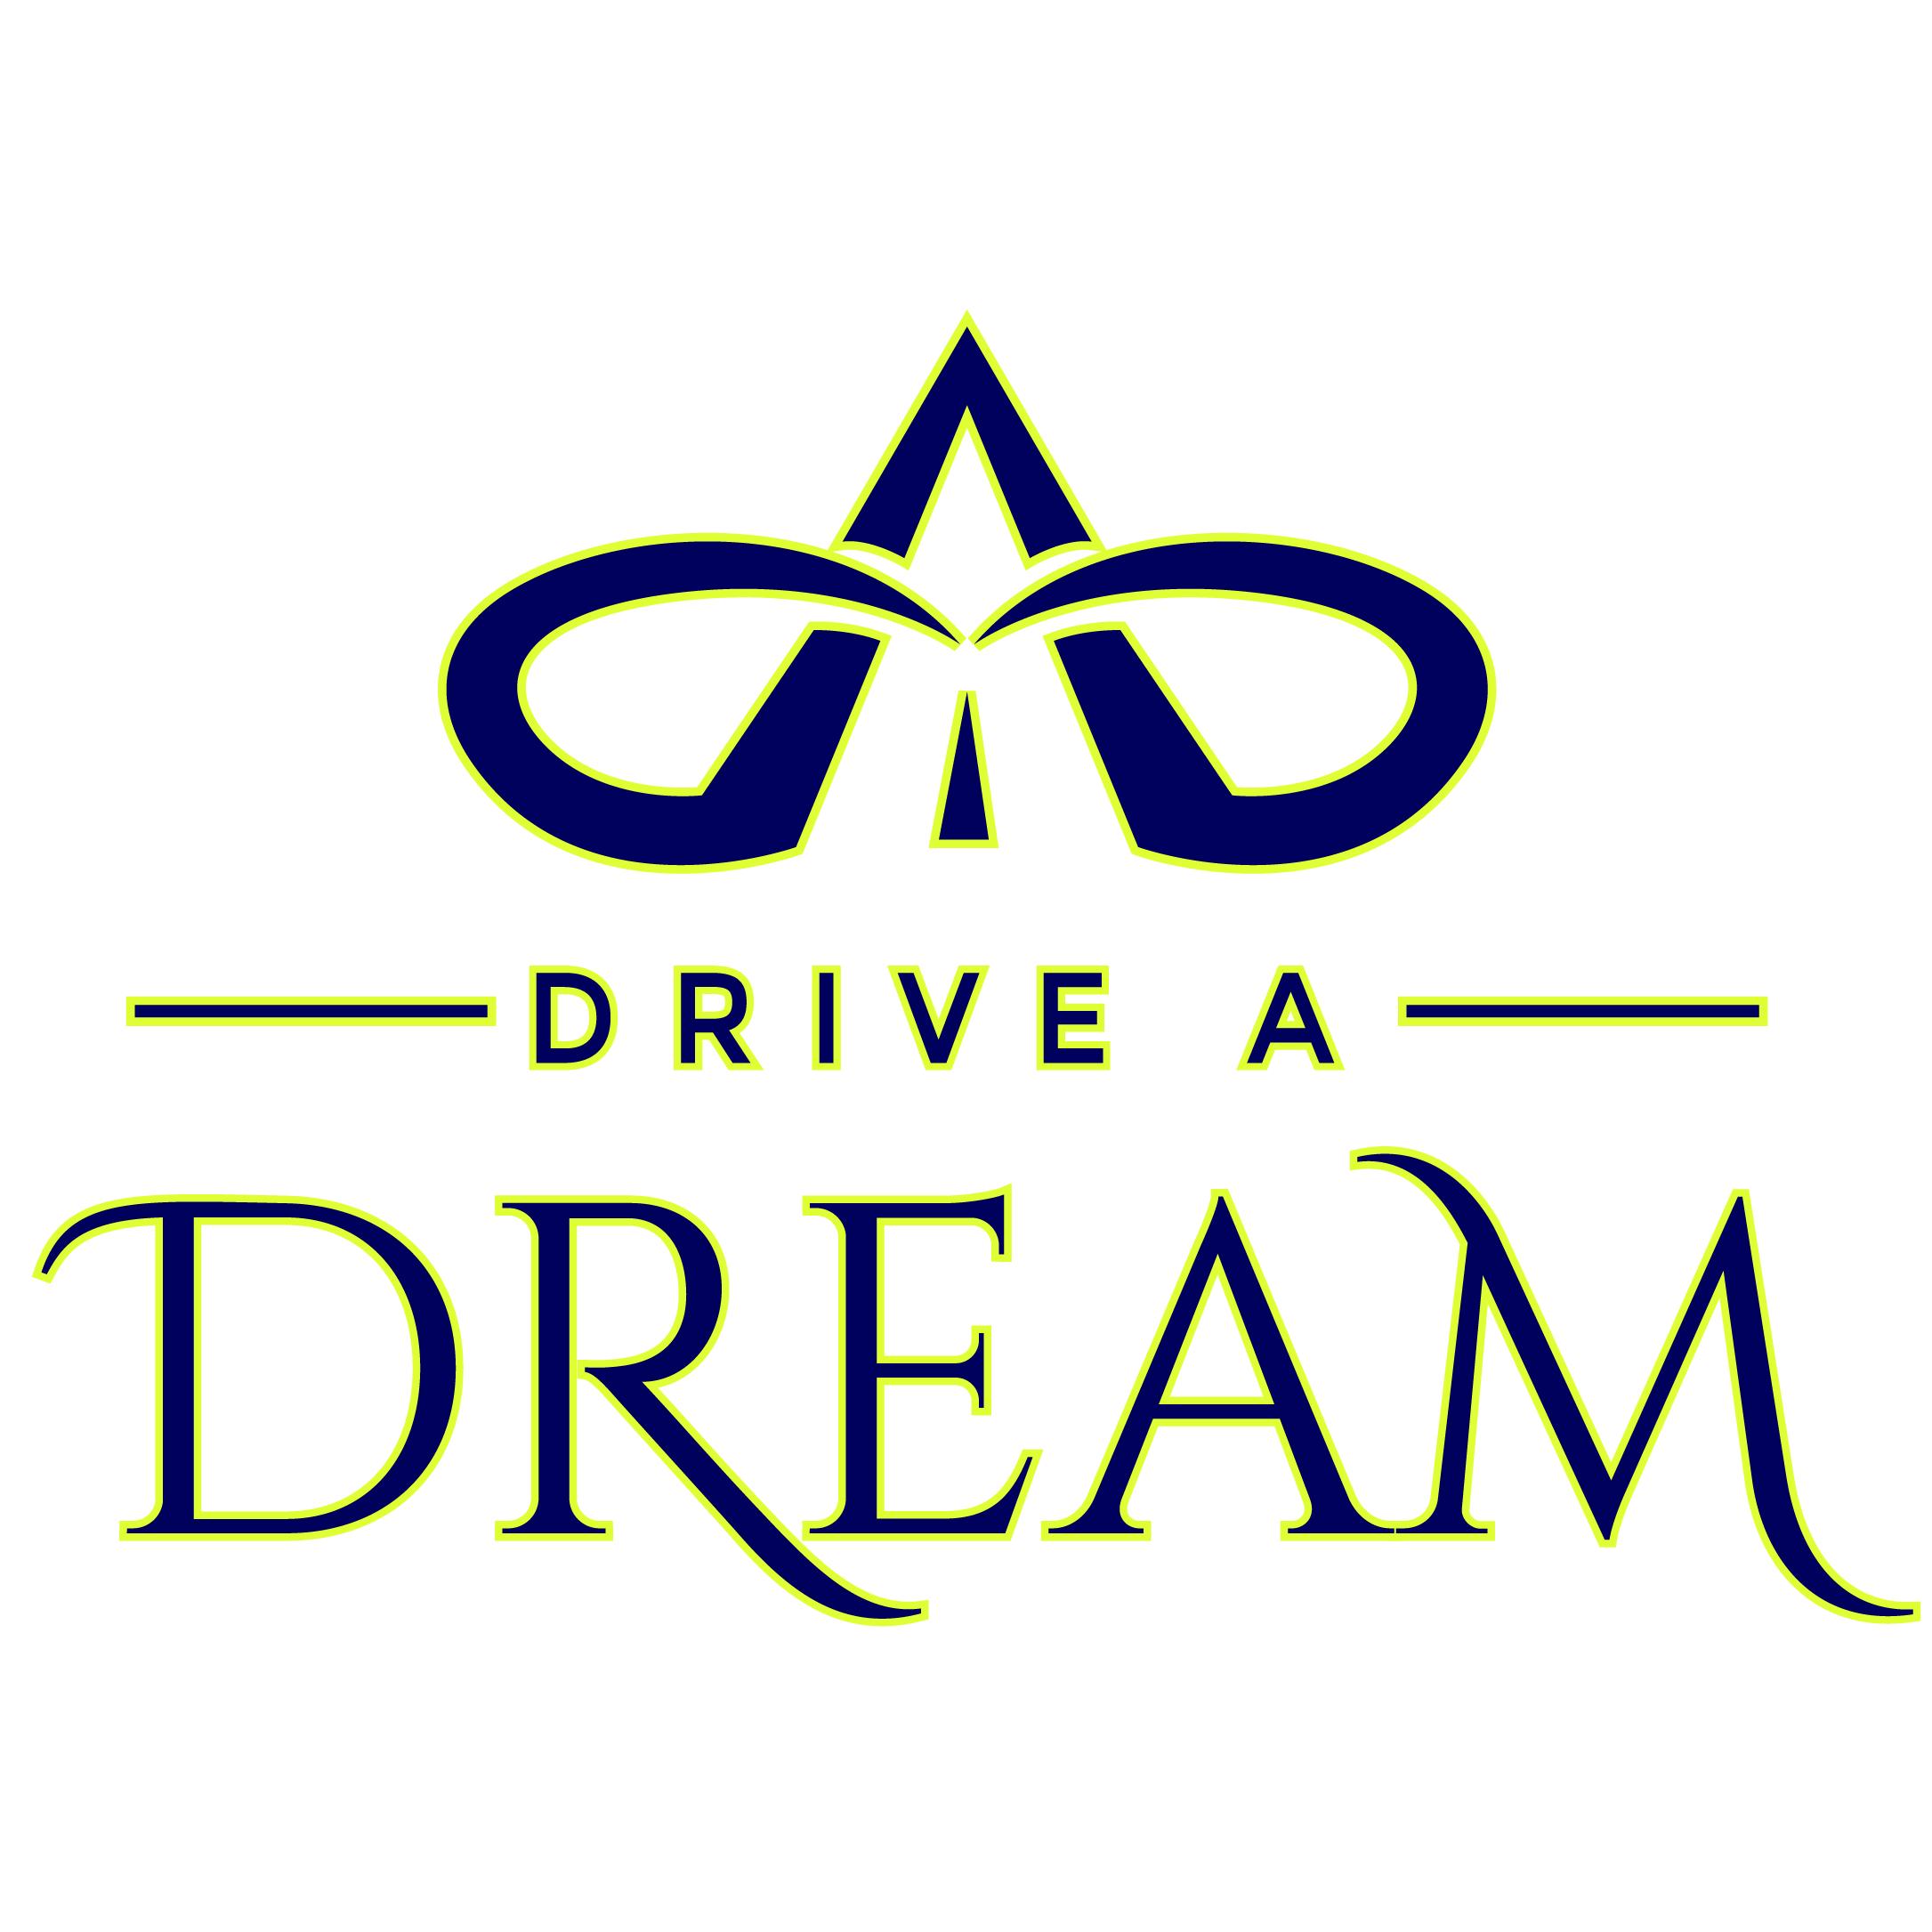 DRIVE A DREAM